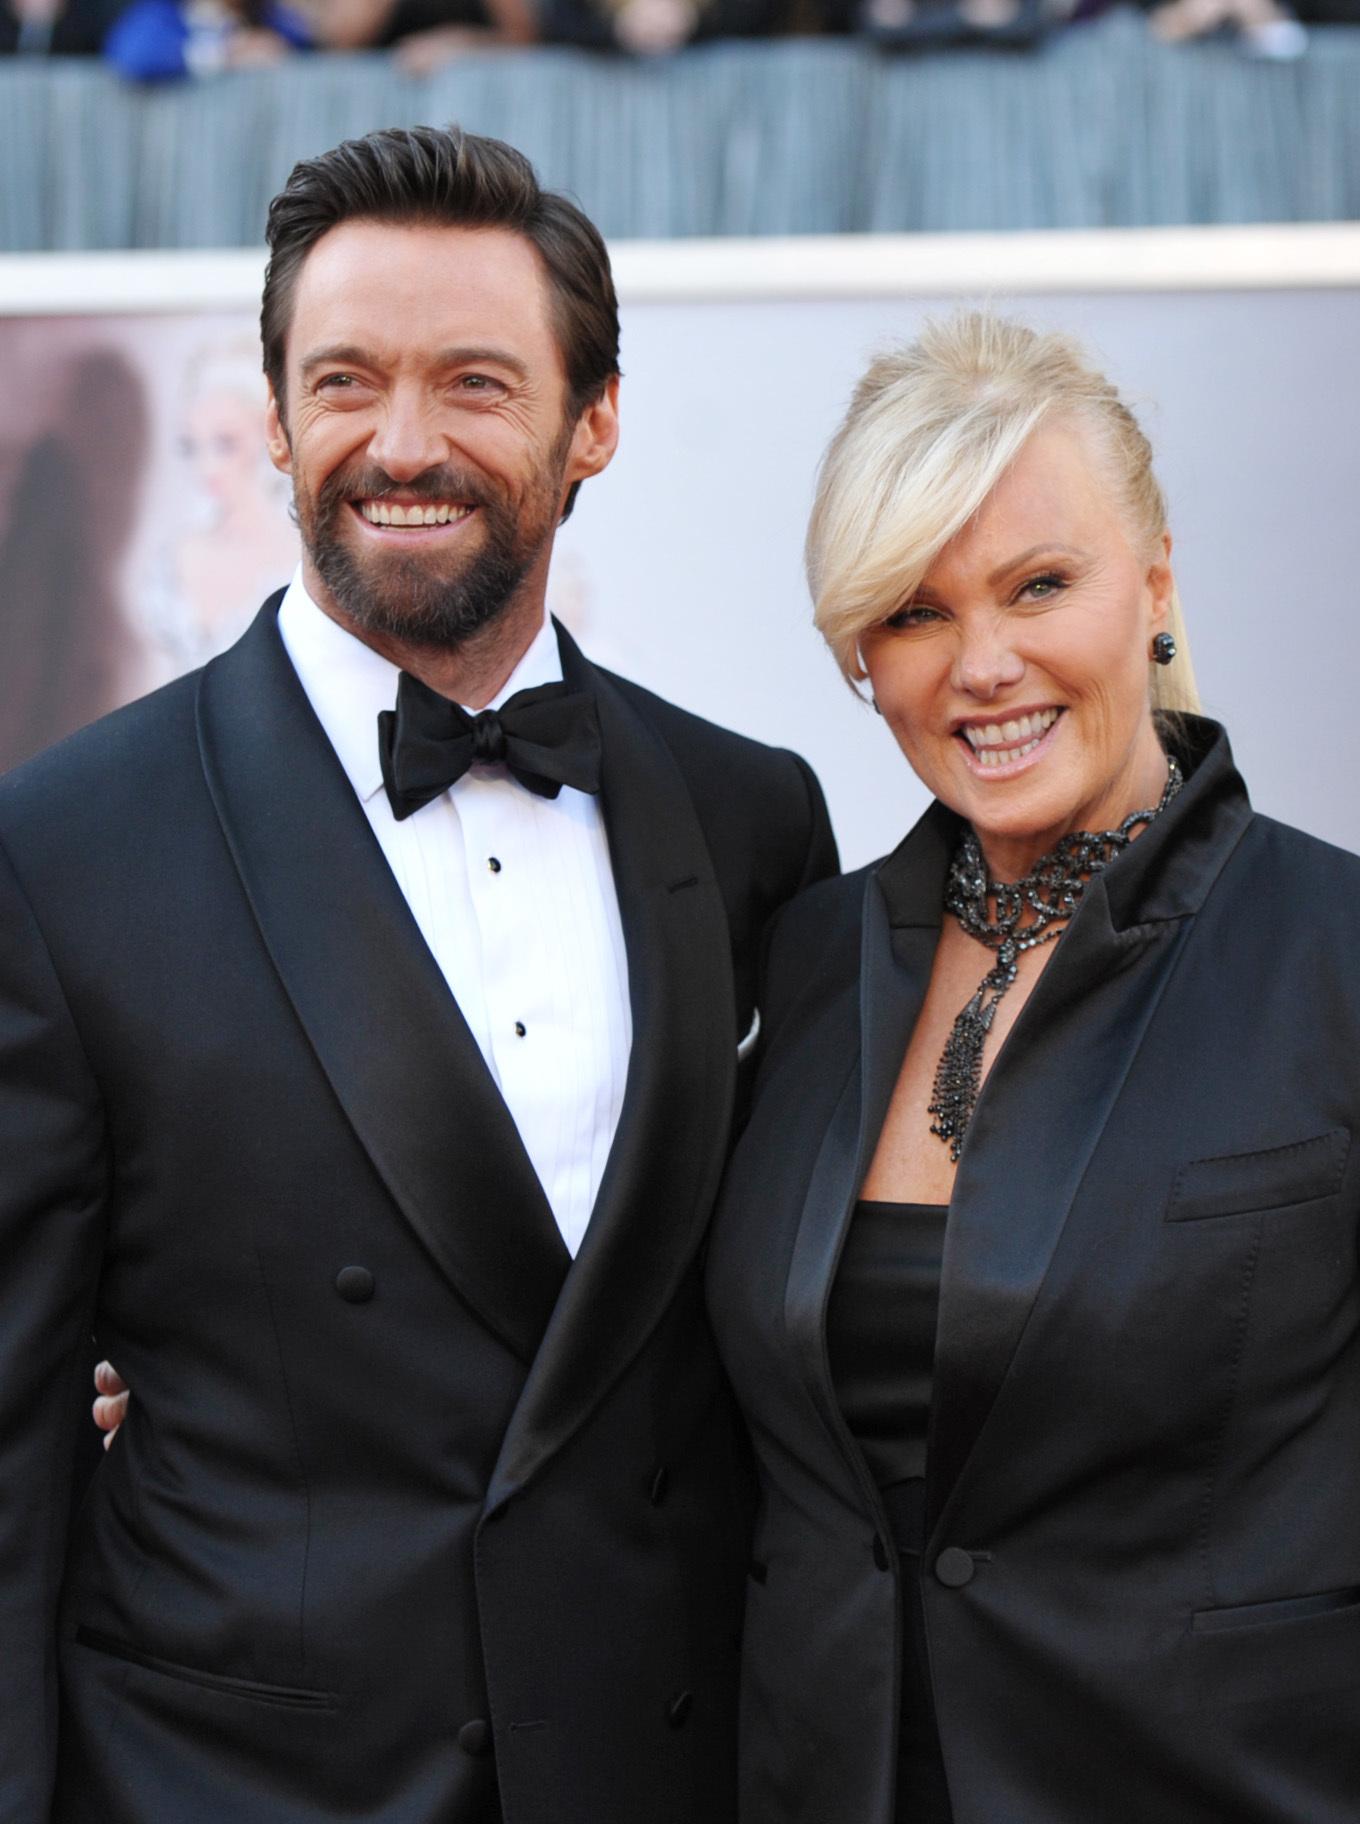 Hugh Jackman and Deborra Lee Furness Oscars 2013